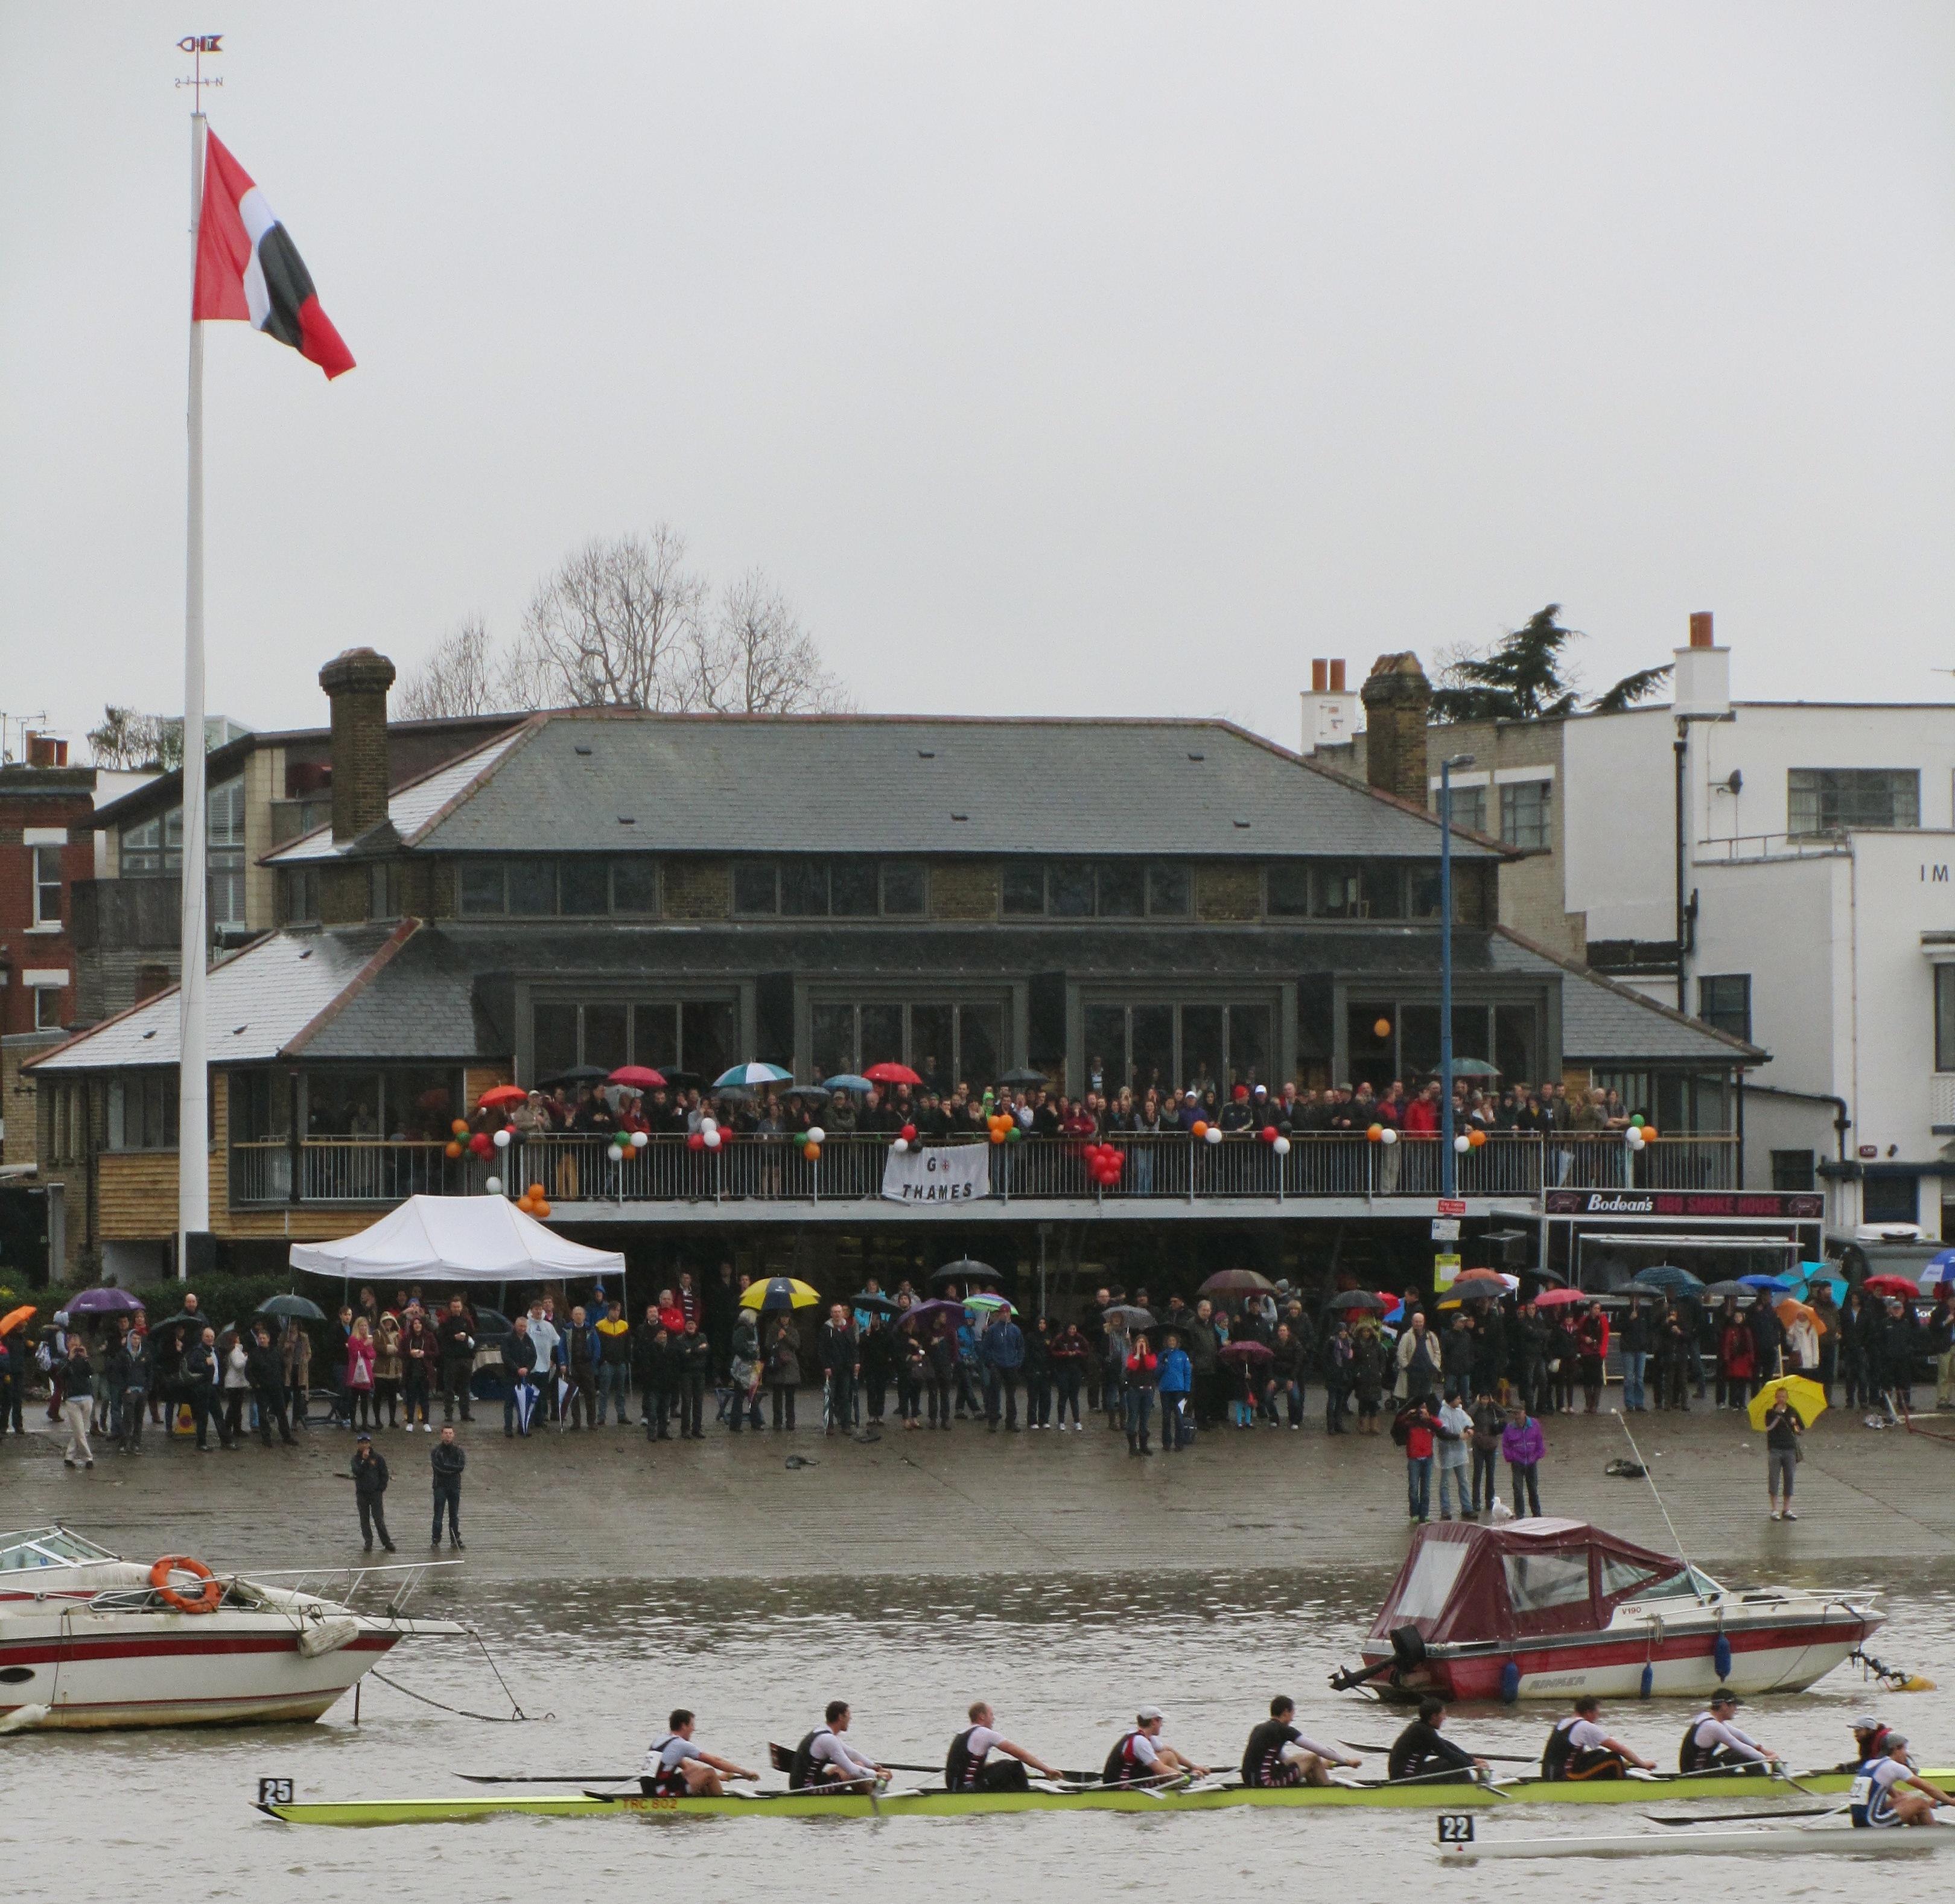 Lewis Rowing Club Thames Rowing Club